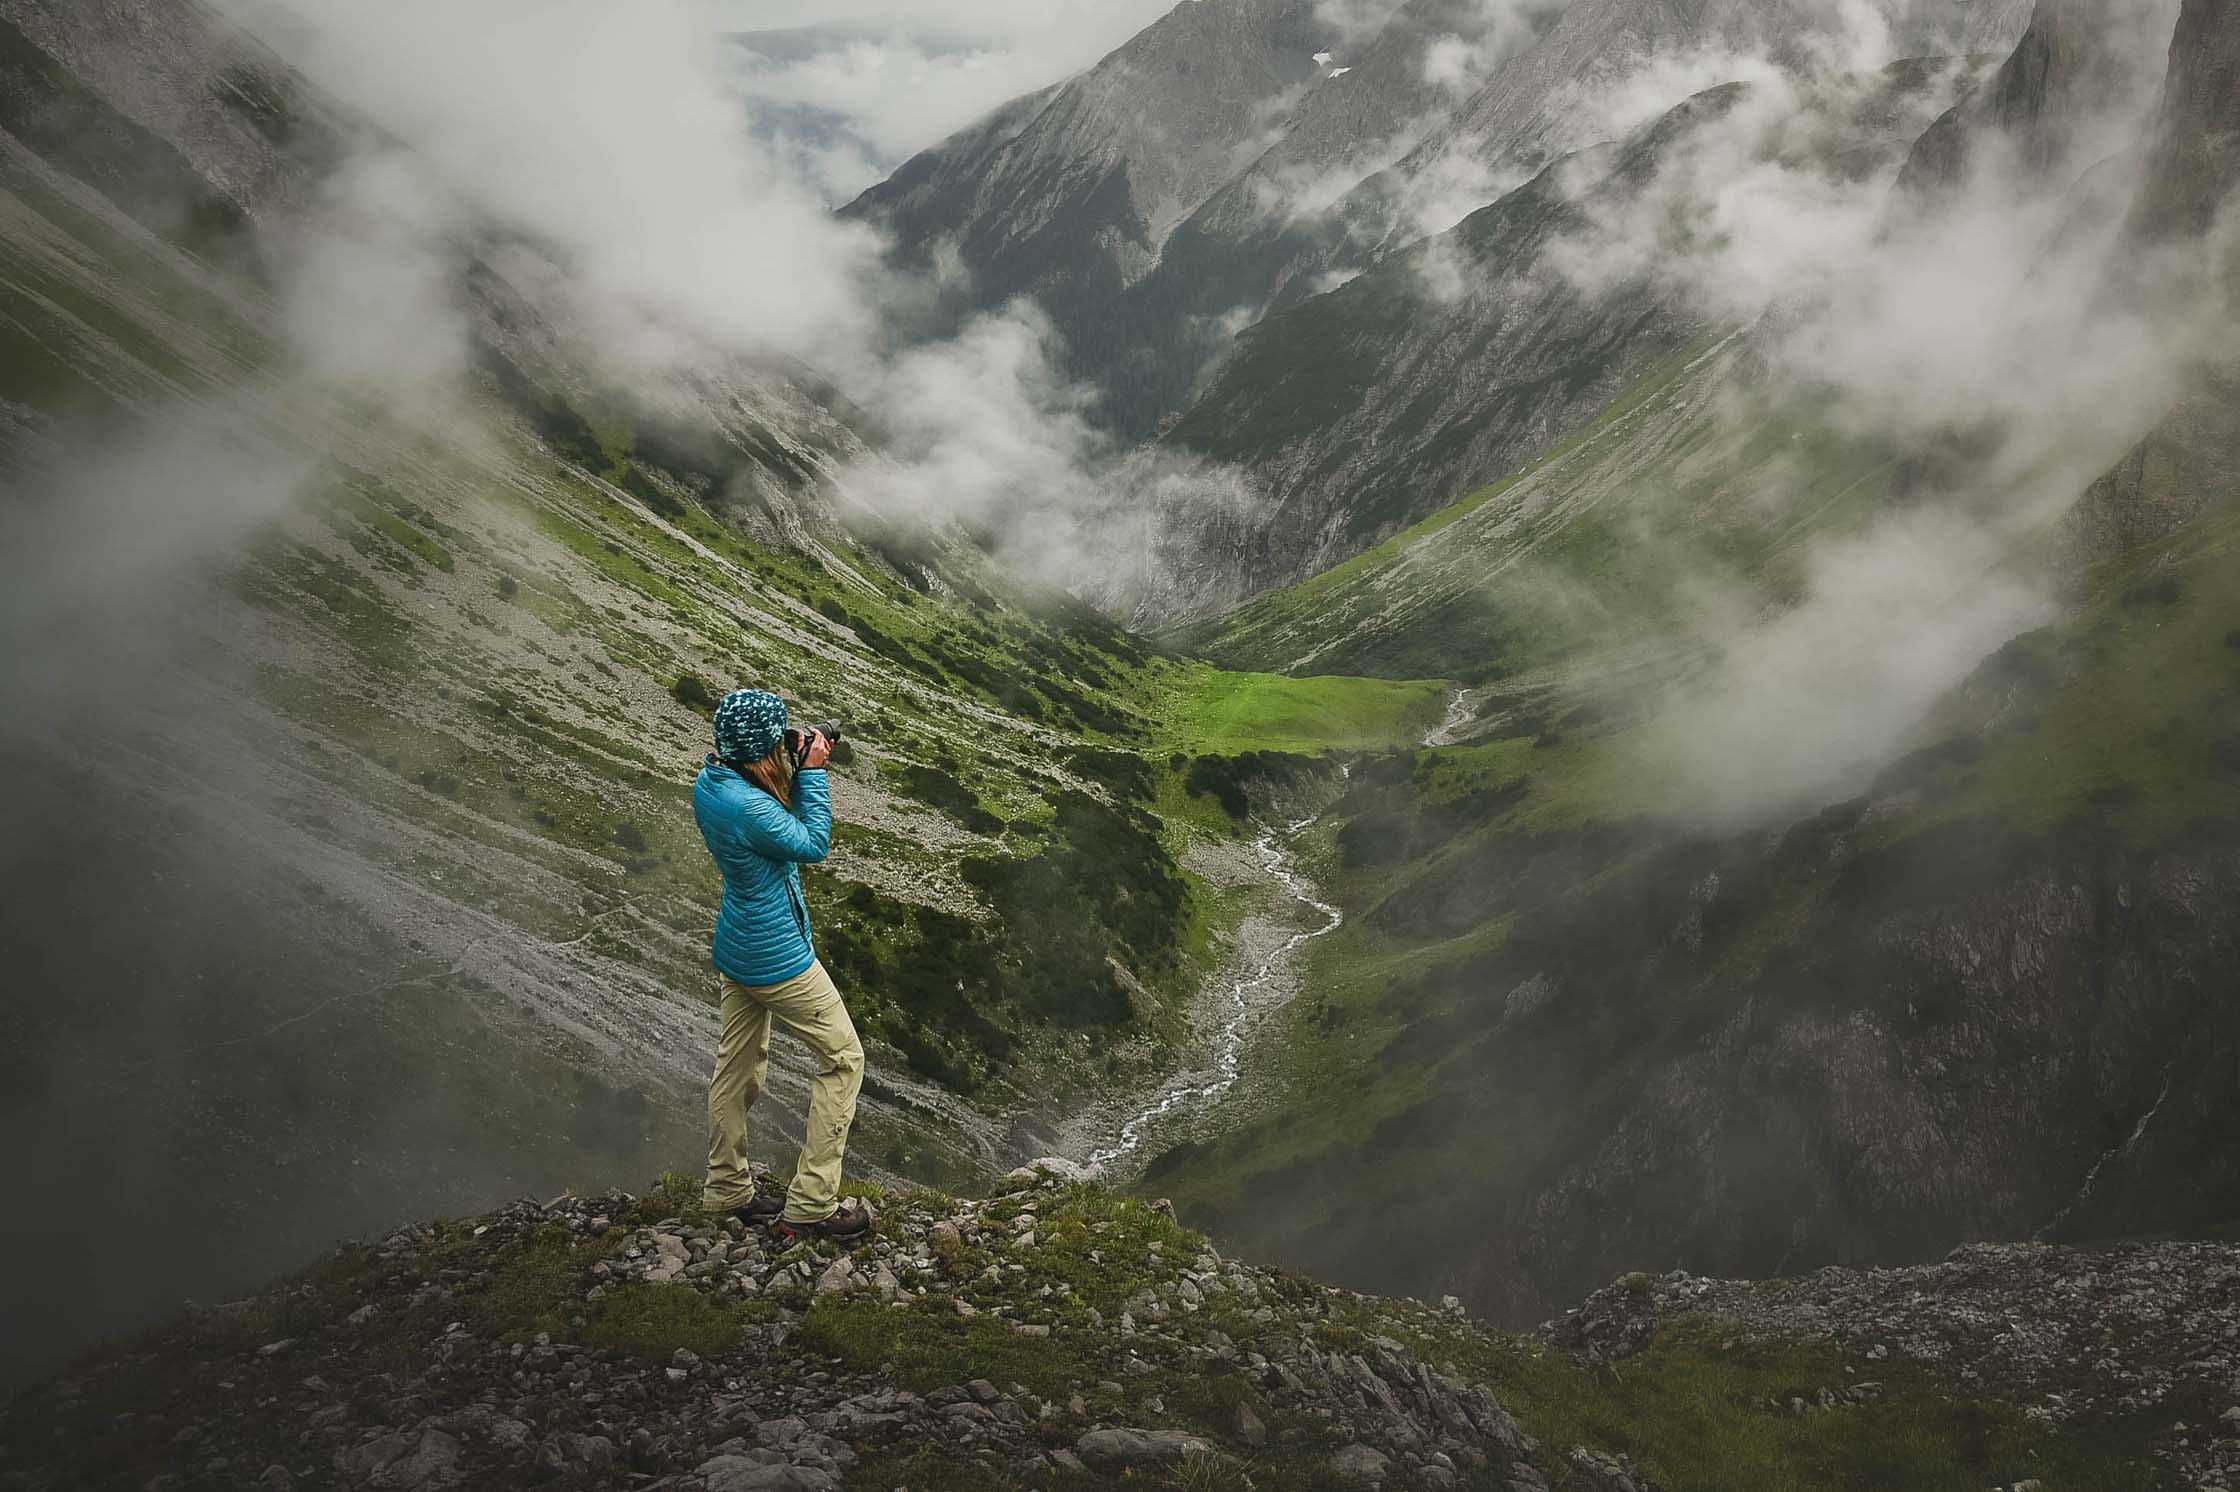 ¿Cómo convertirte en fotógrafo de montaña?